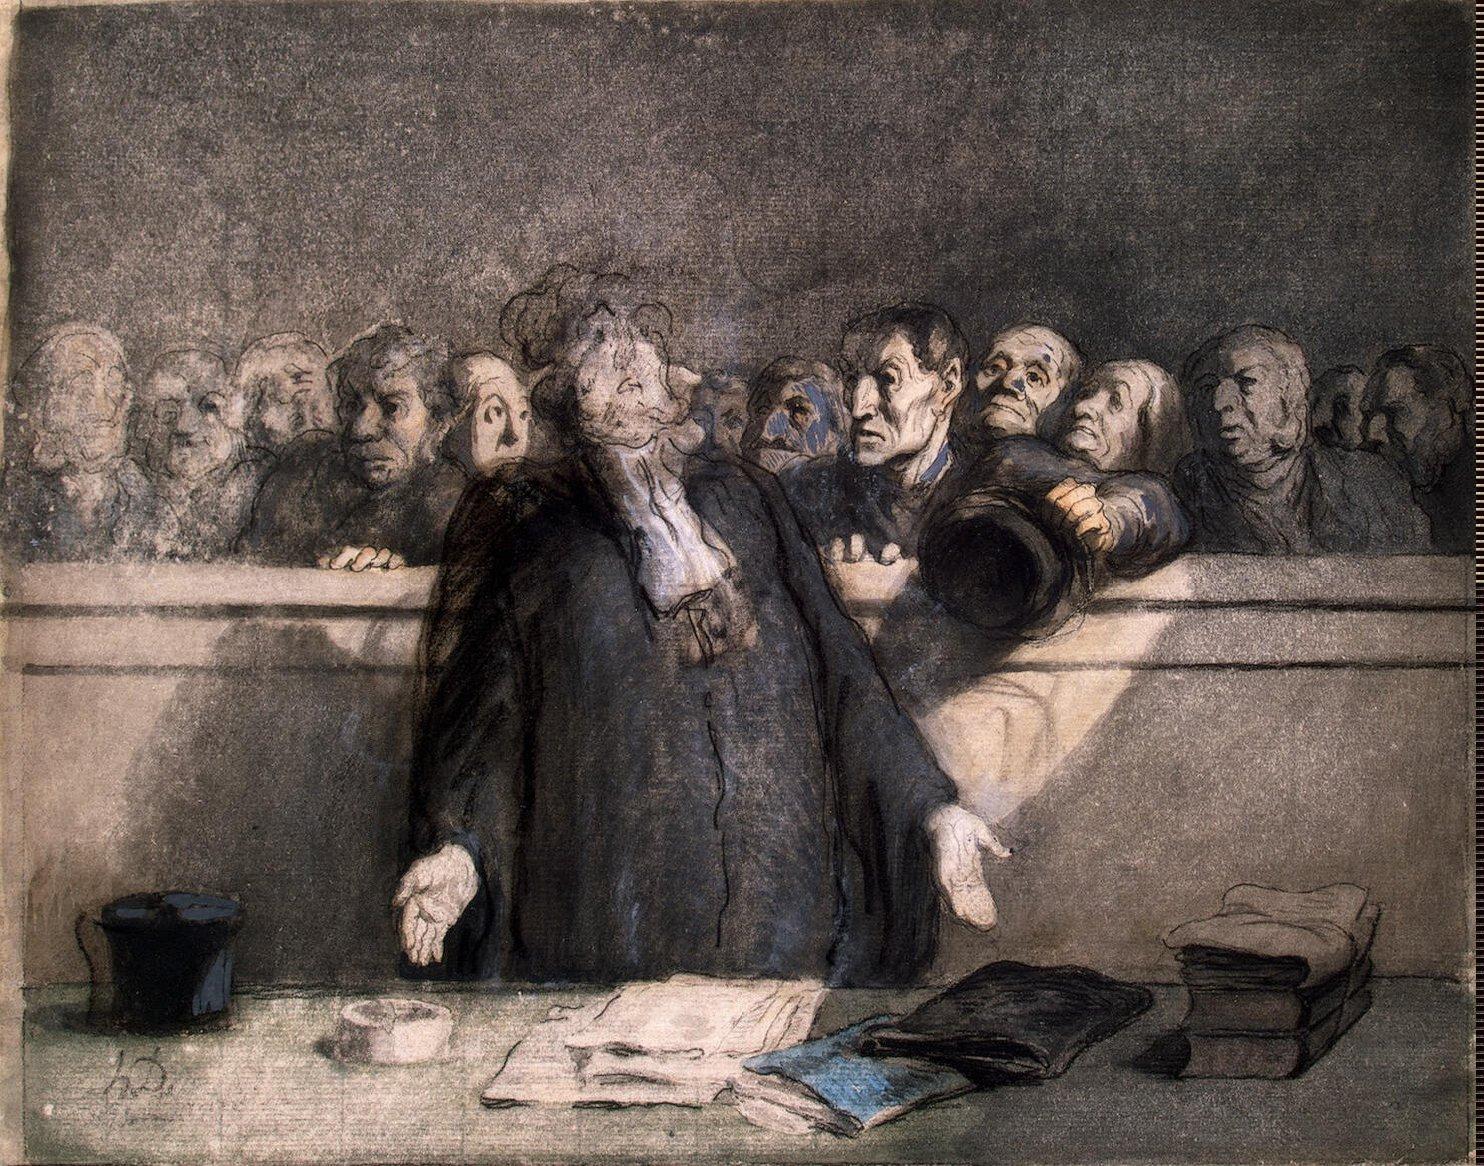 Defense-Plea-G-Daumier-Honore-oil-painti